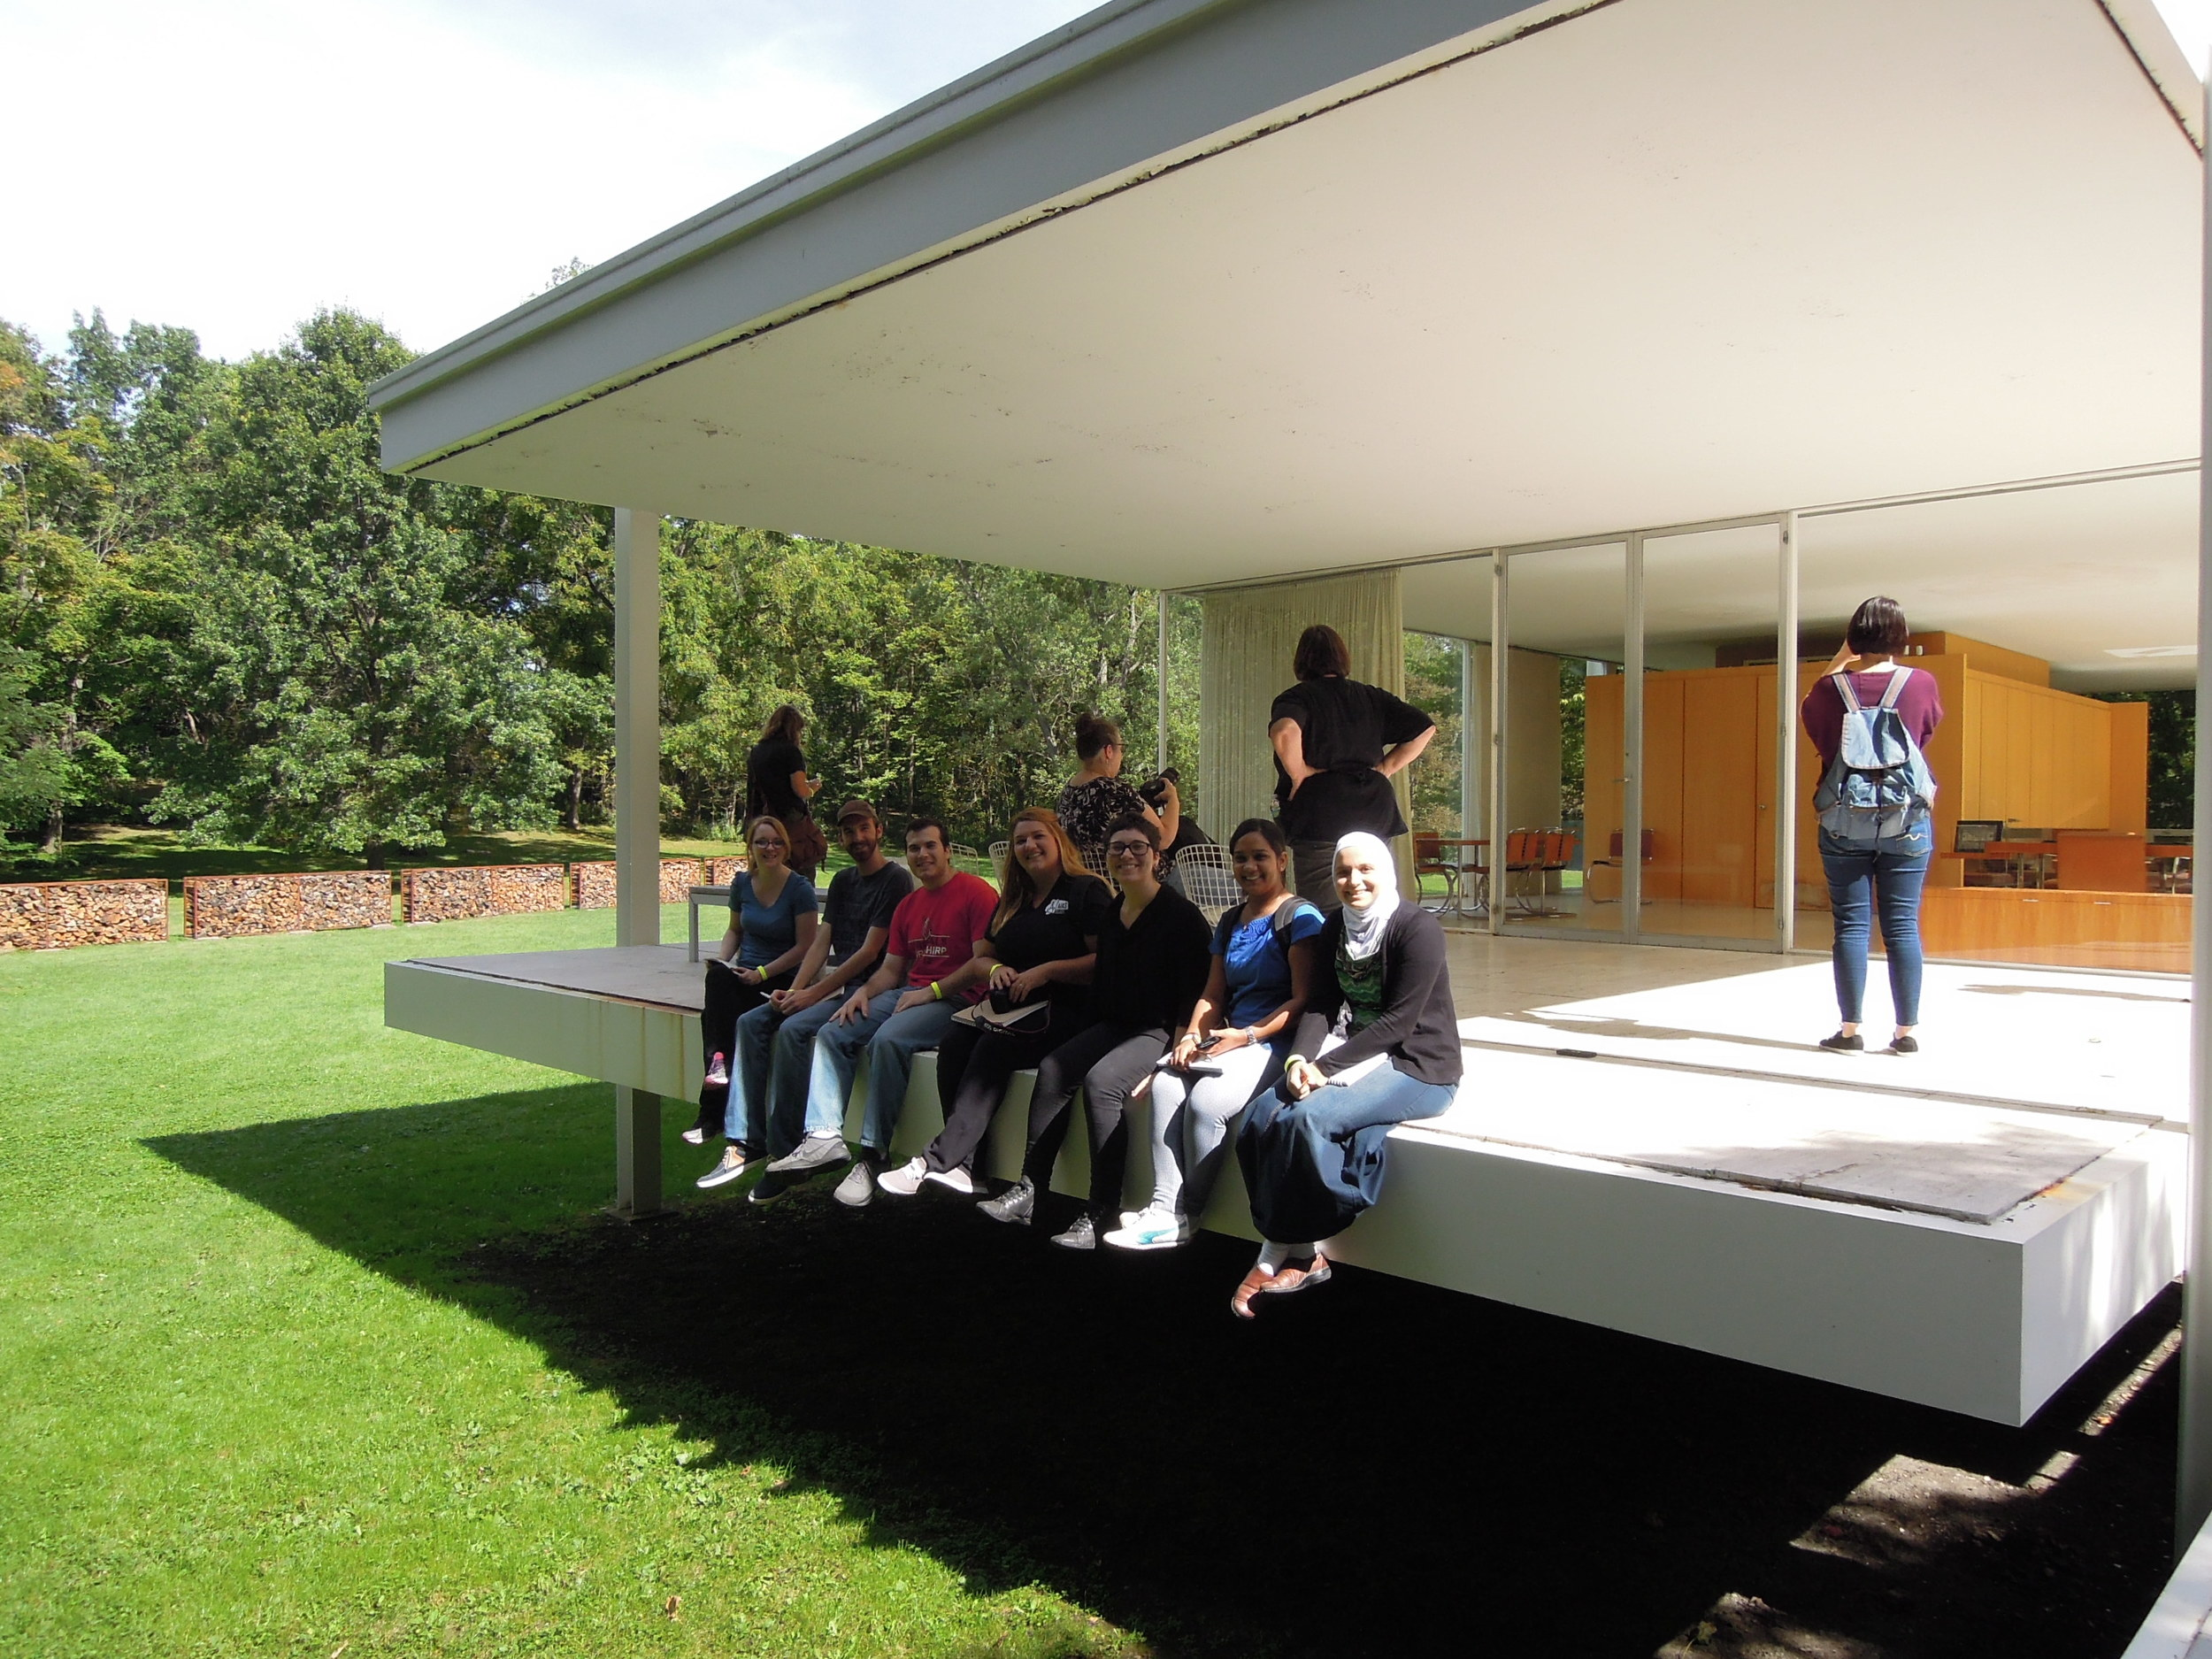 ARCH501 2015 Field Trip Week, Farnsworth House, Mies van der Rohe, photo: Jonathan Spodek